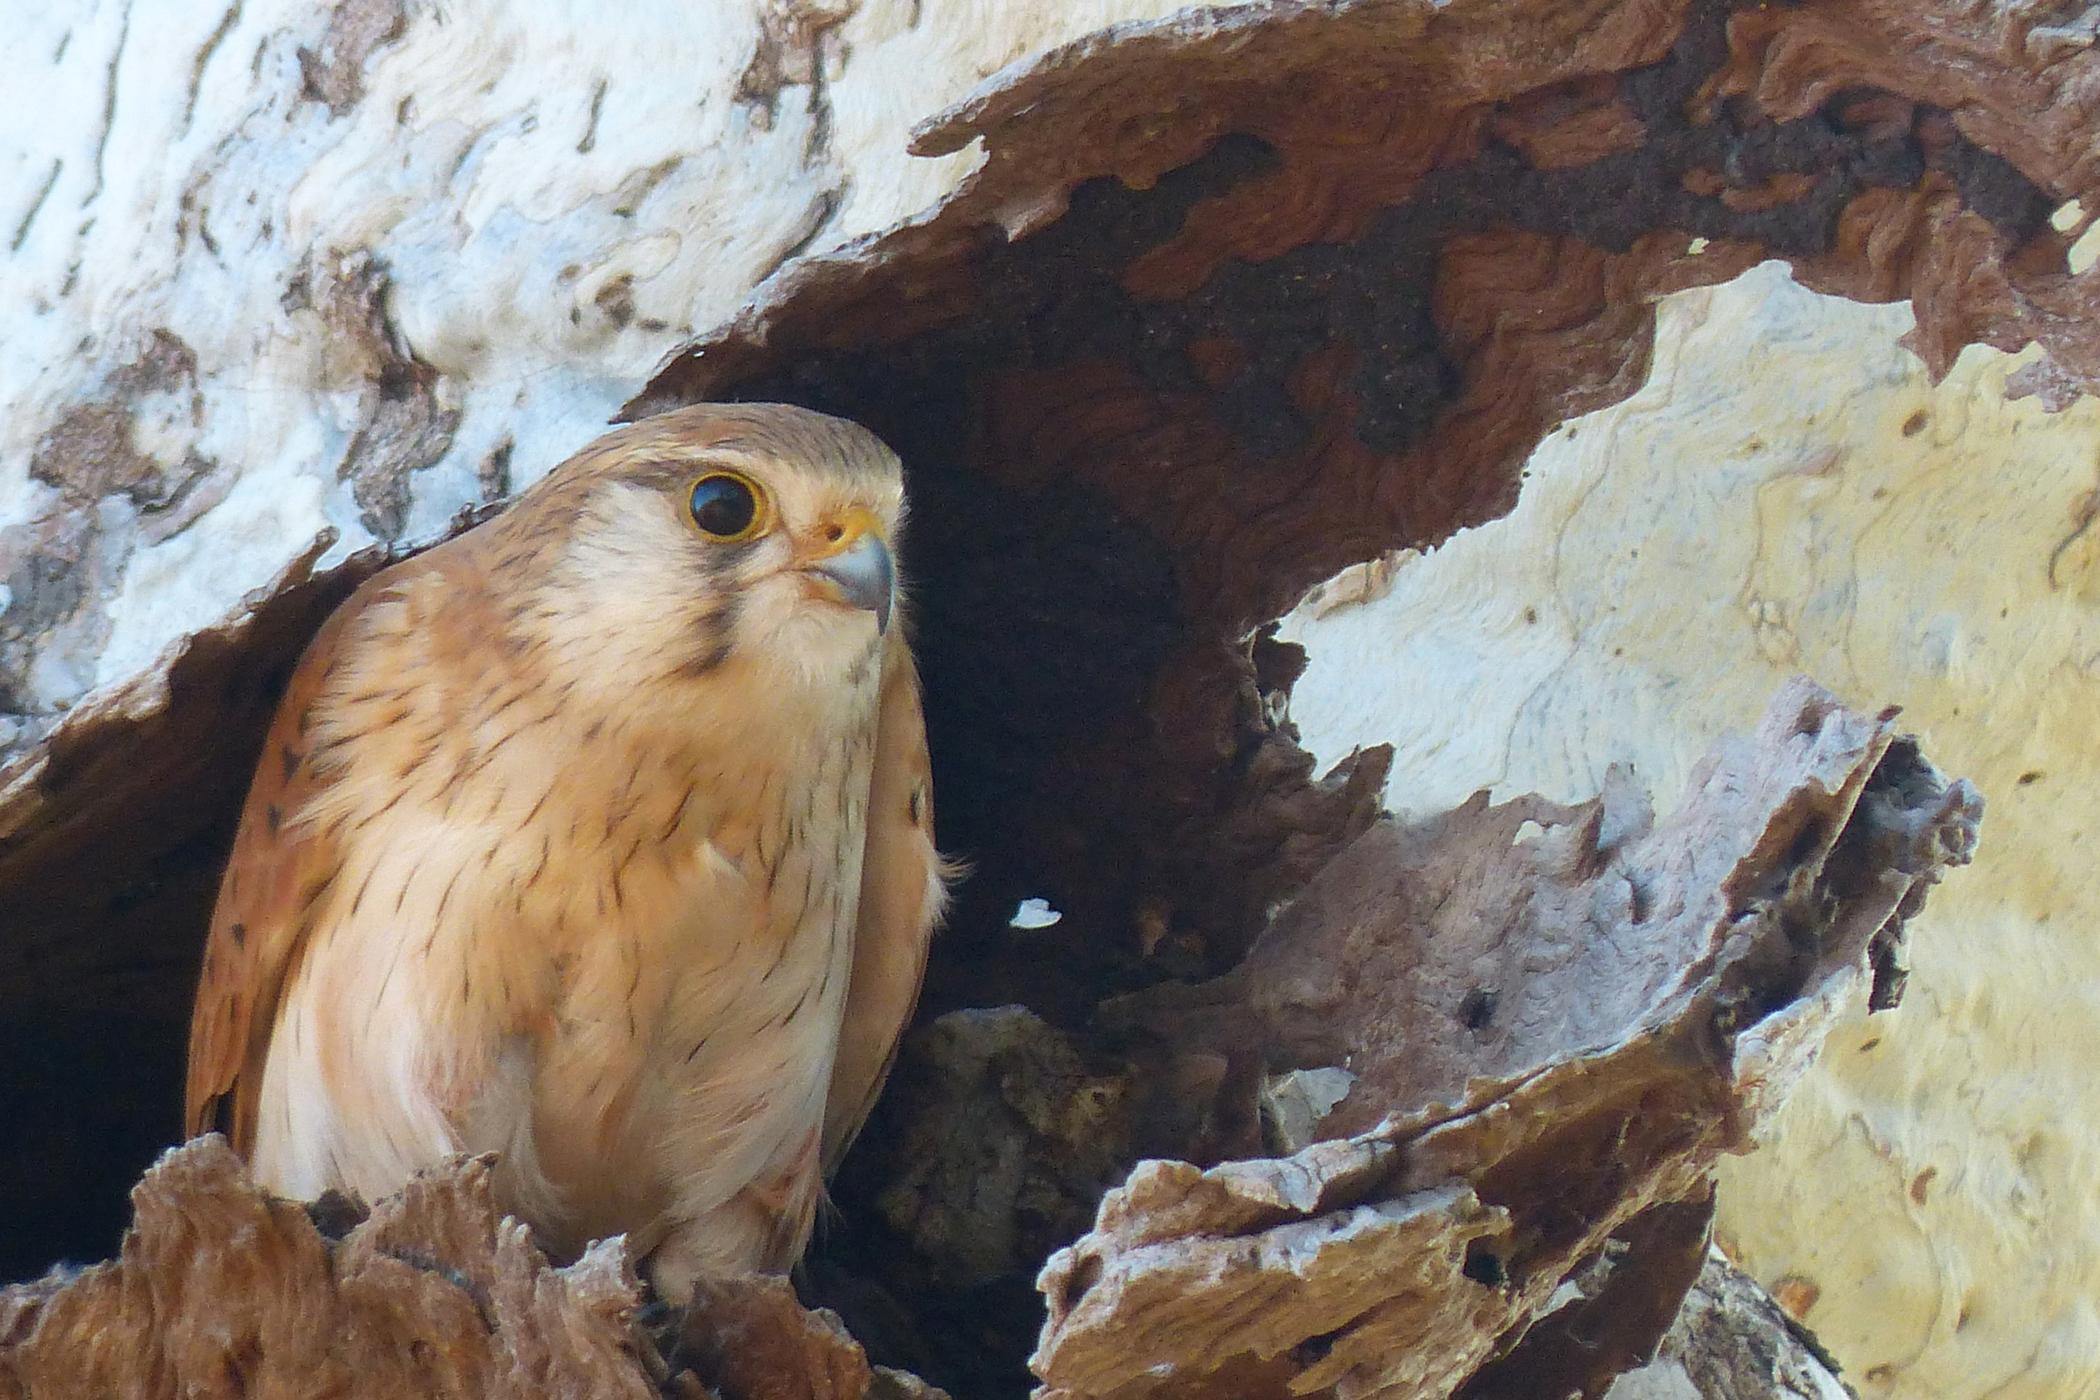 Campylobacter Infection in Birds